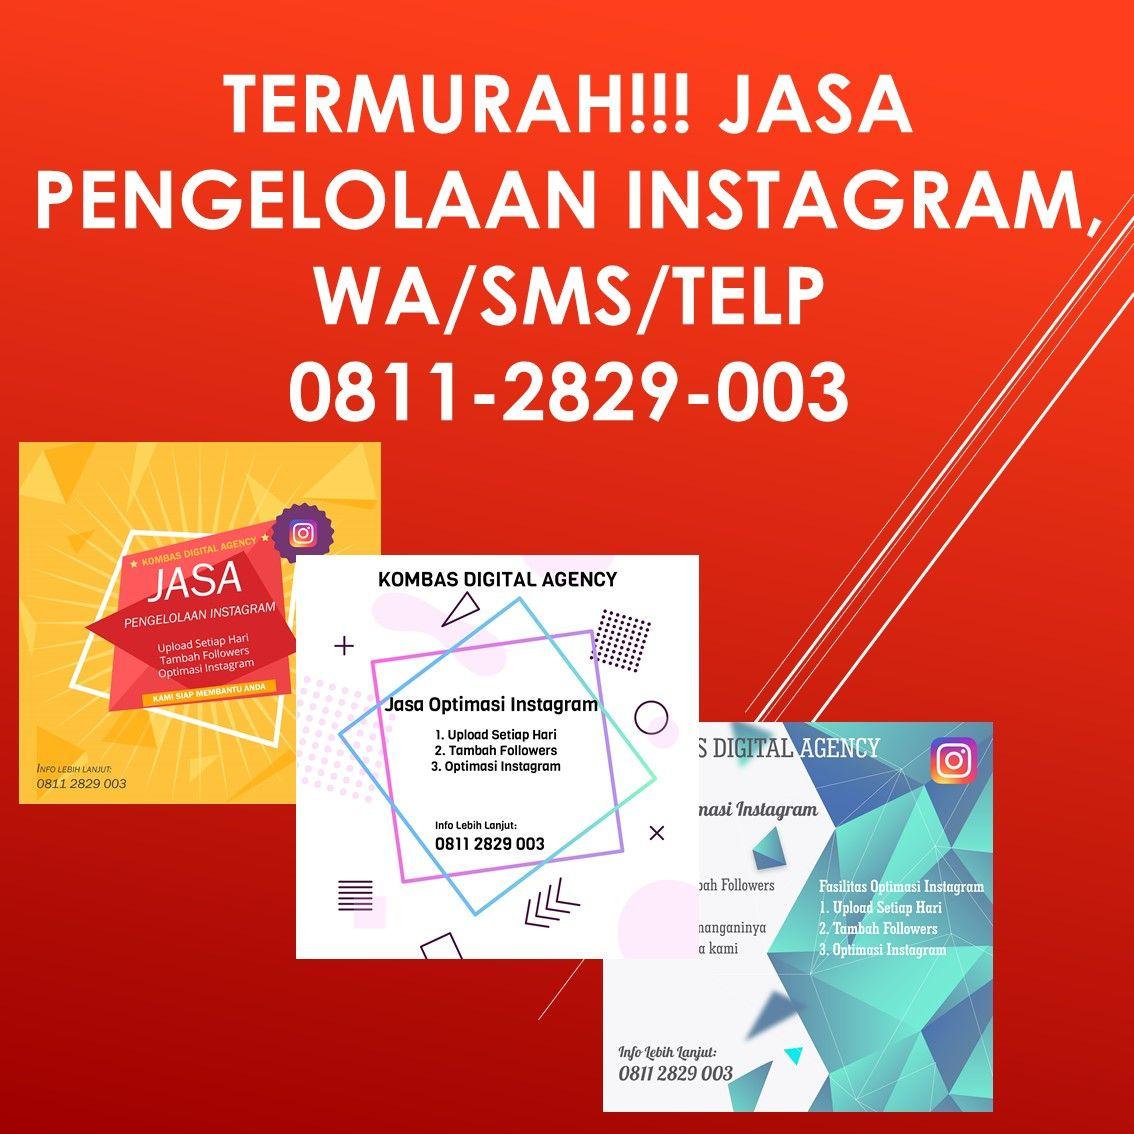 Termurah Jasa Pengelolaan Instagram Wa Sms Telp 0811 2829 003 Jasa Pengelolaan Instagram Merupakan Jasa Yang Membantu Mengelola Instagram Anda Instagram Sms